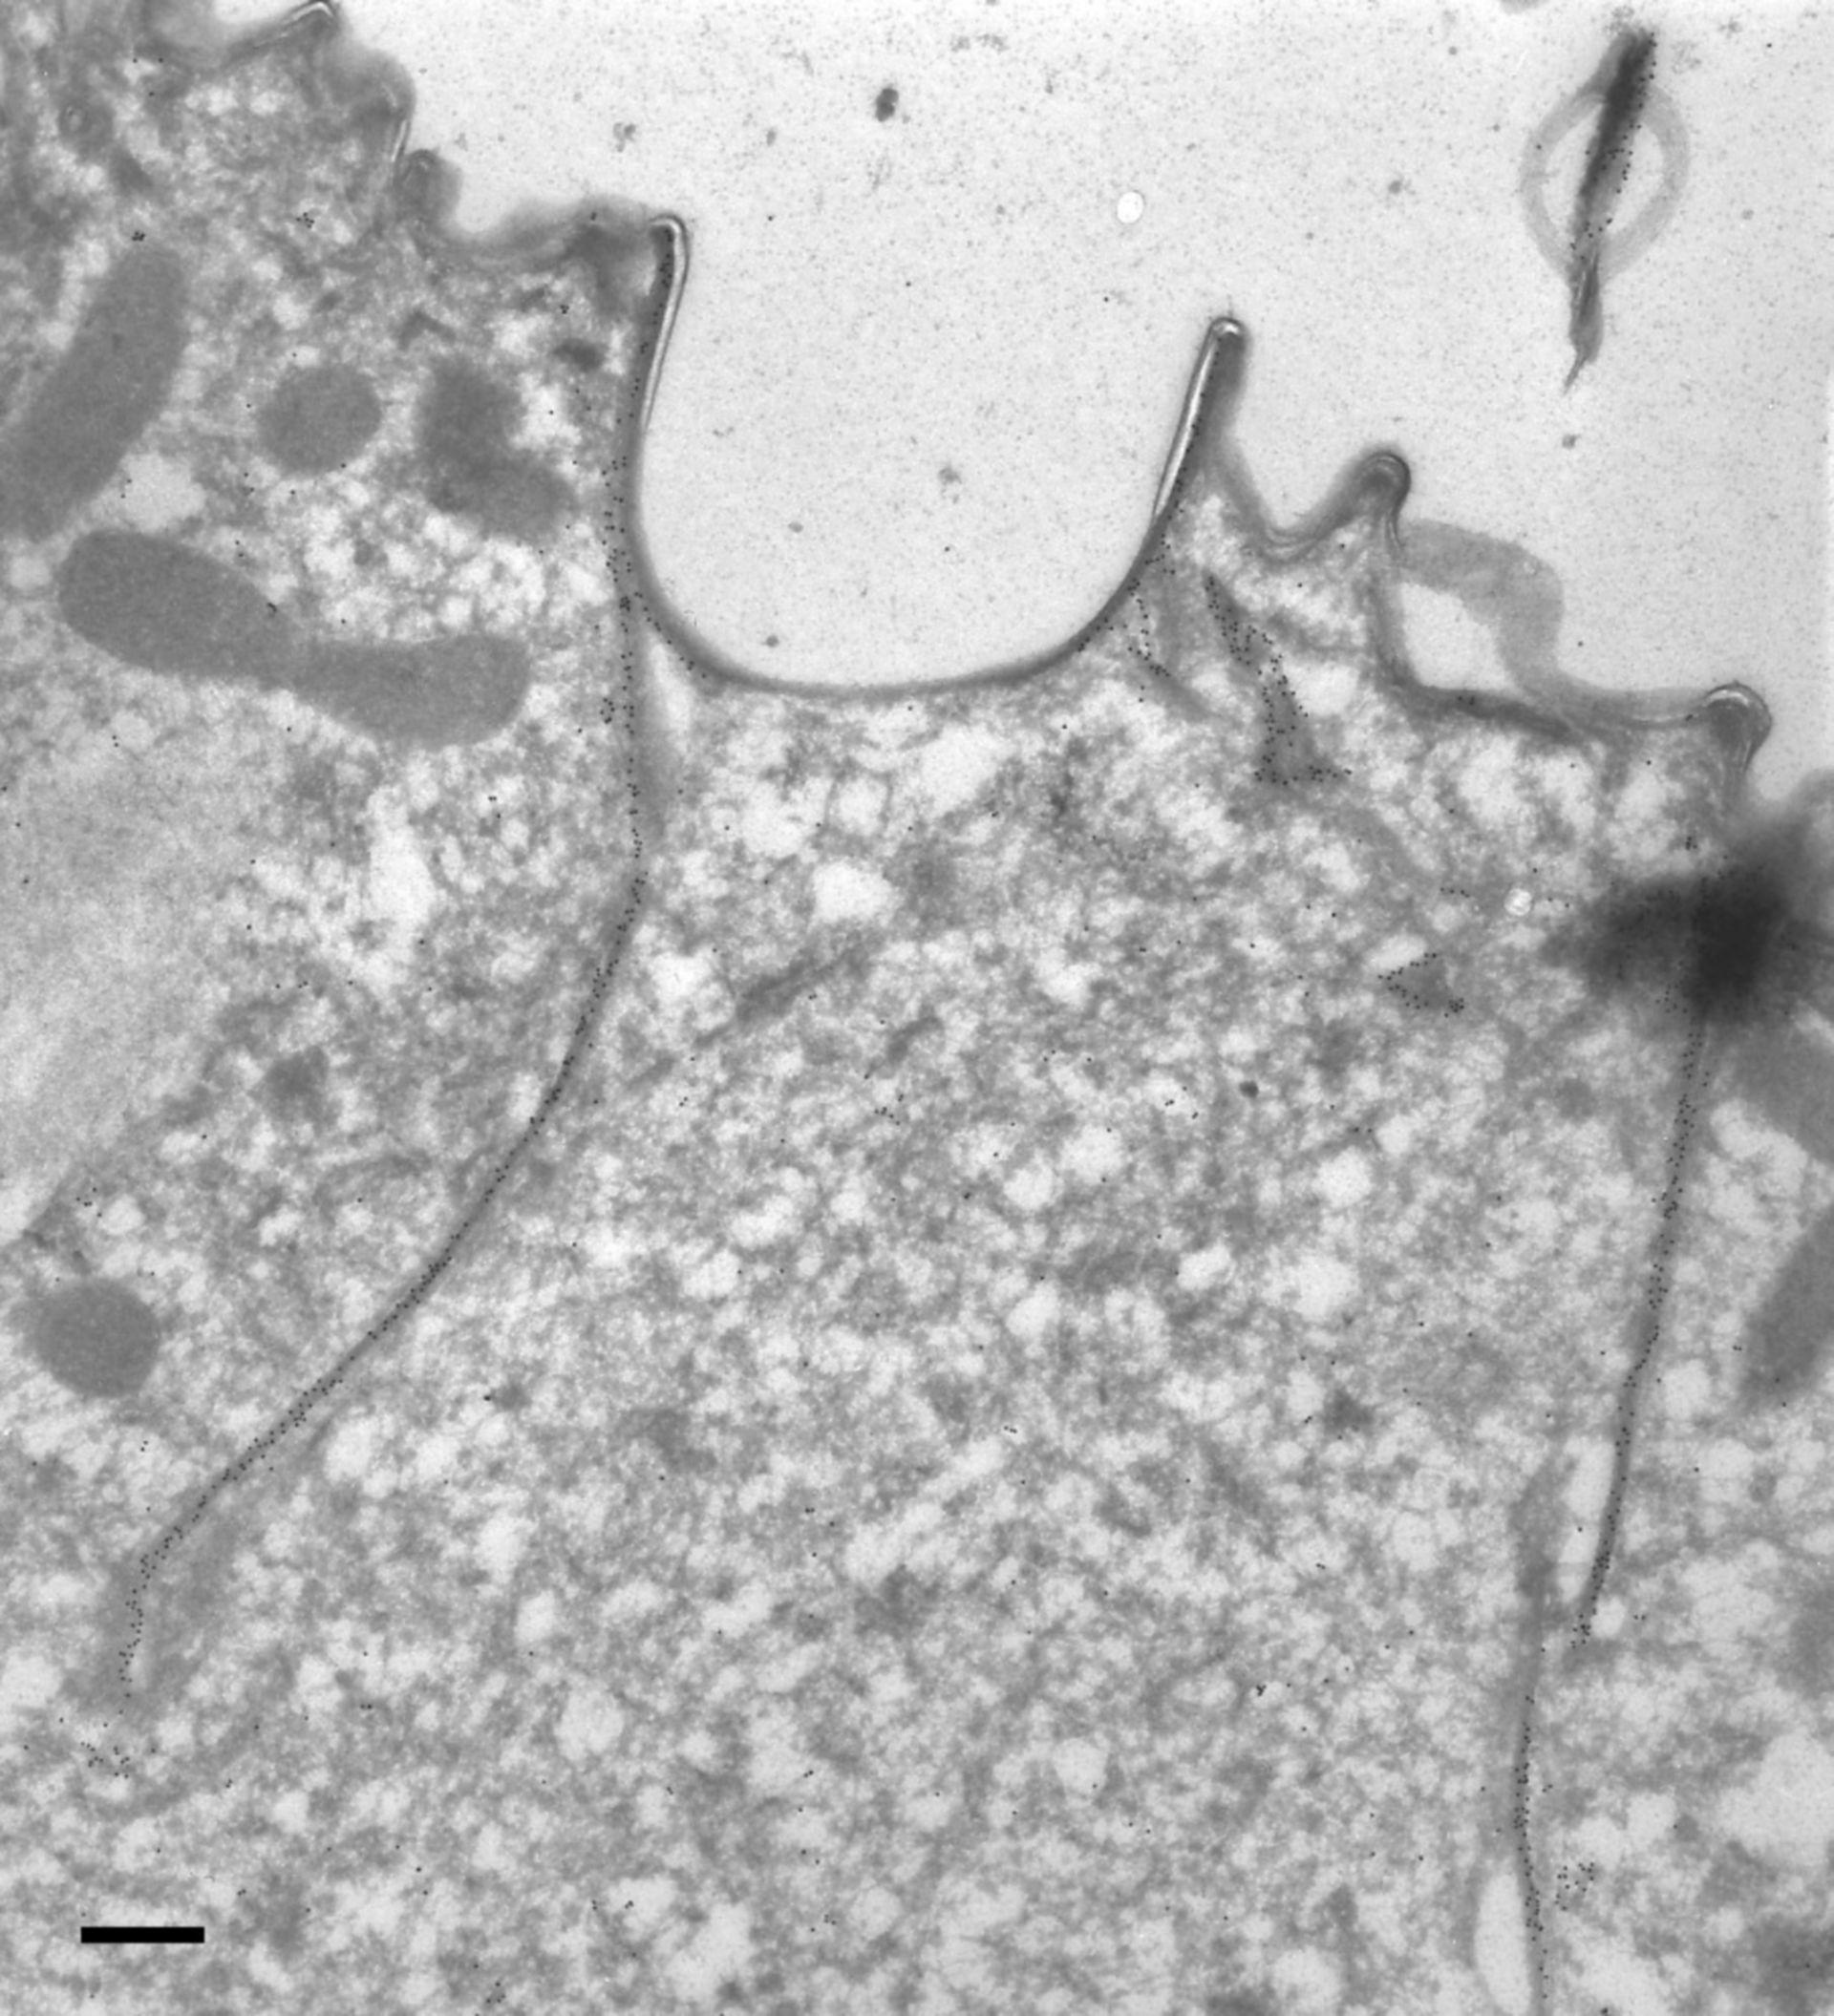 Paramecium tetraurelia (citoscheletro micrtotubulo corticale) - CIL:9852